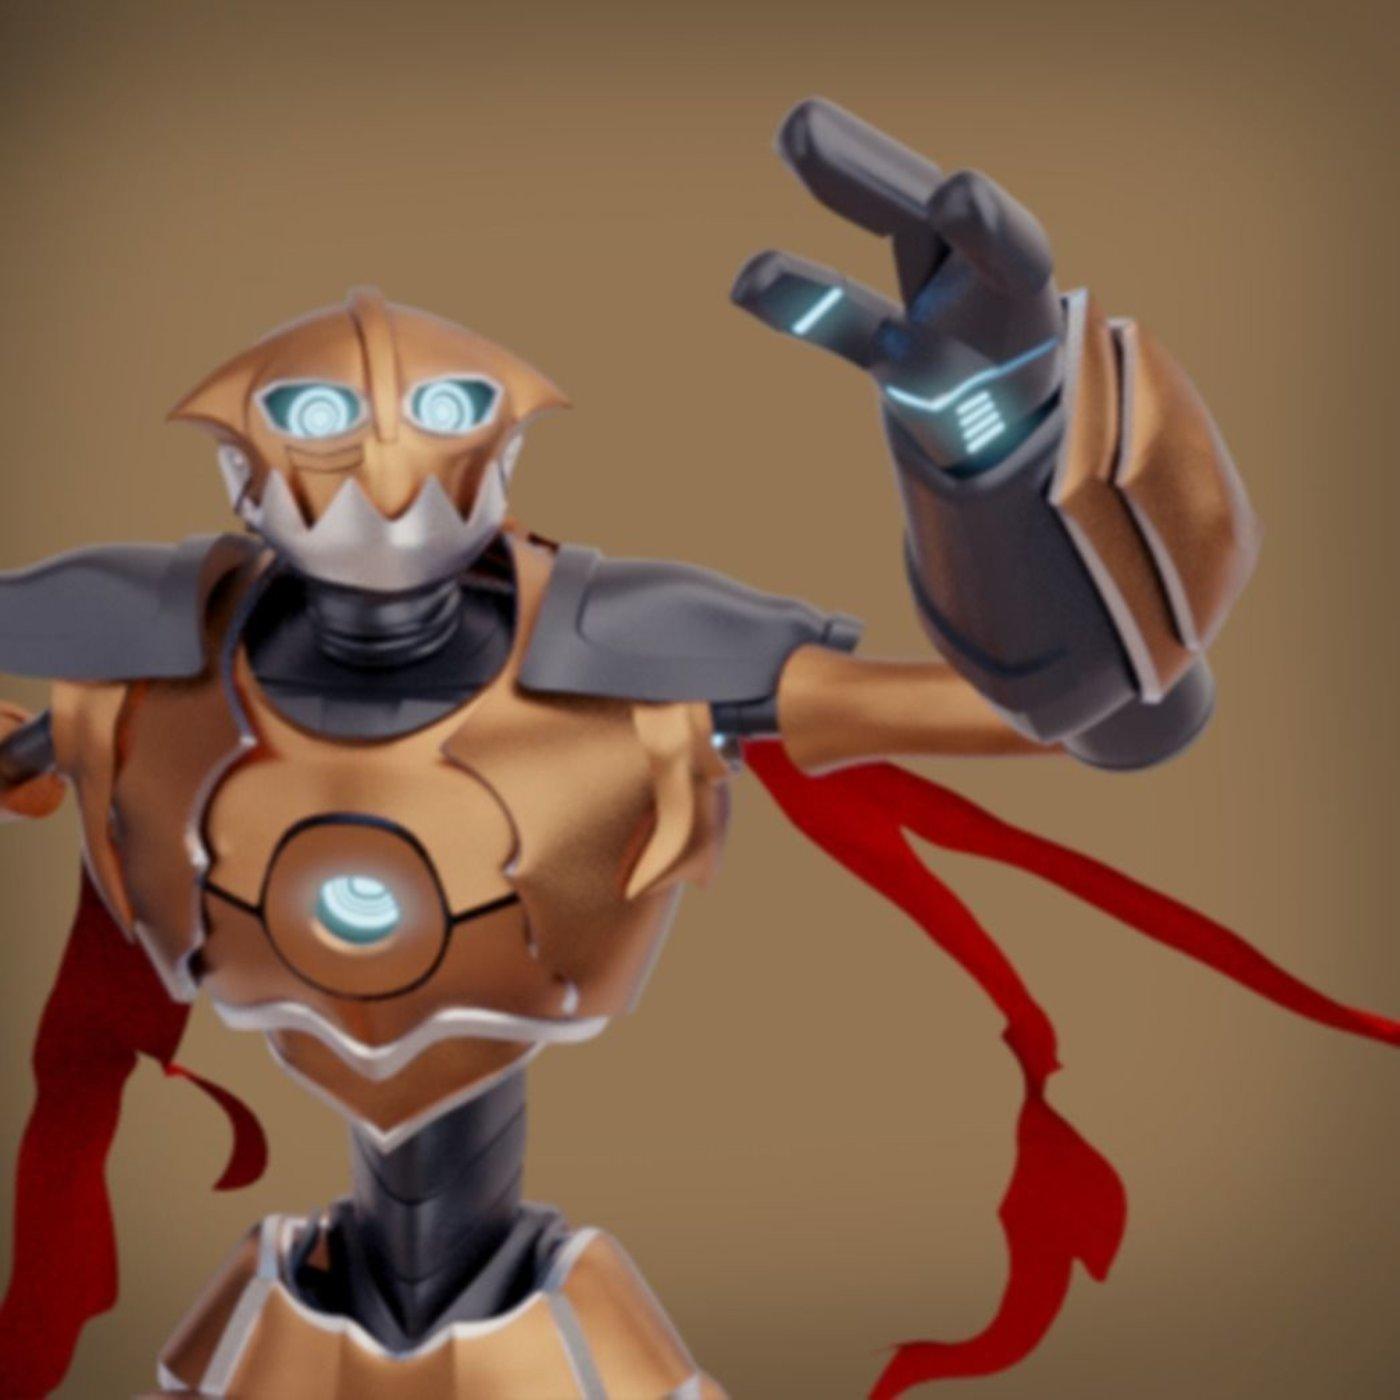 Skater robot_rigged character